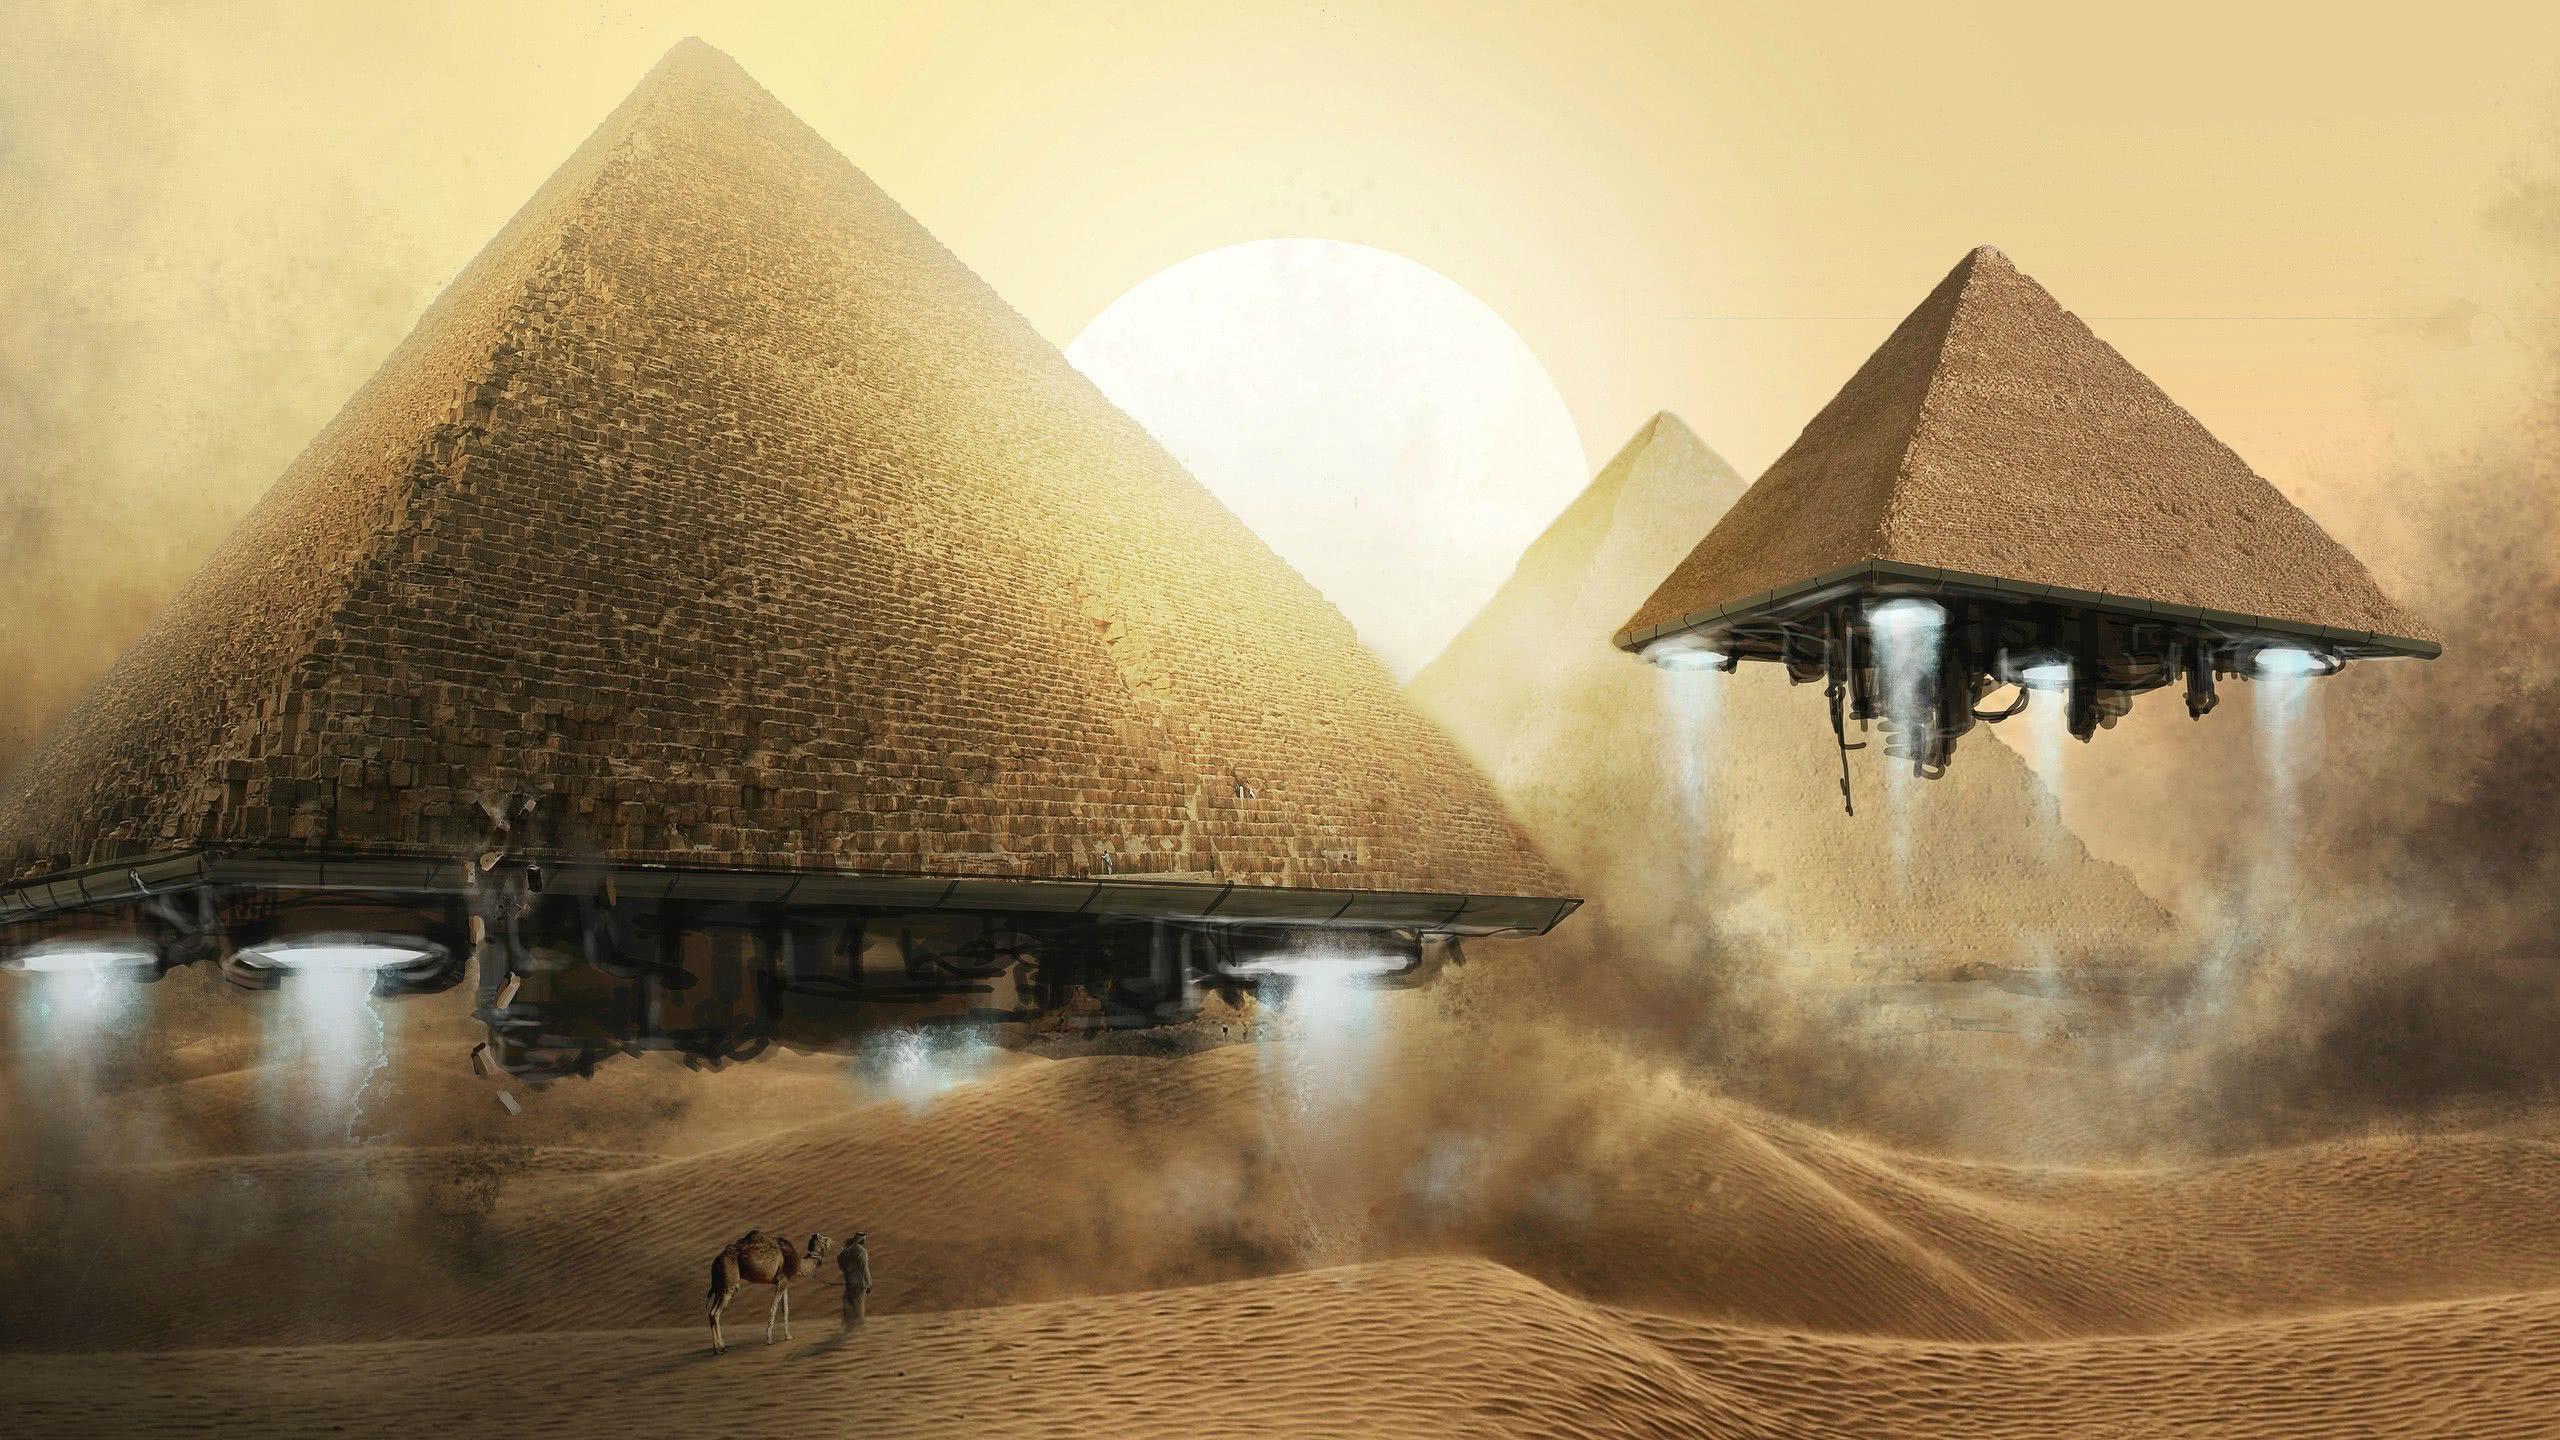 alien pyramids wqhd 1440p wallpaper